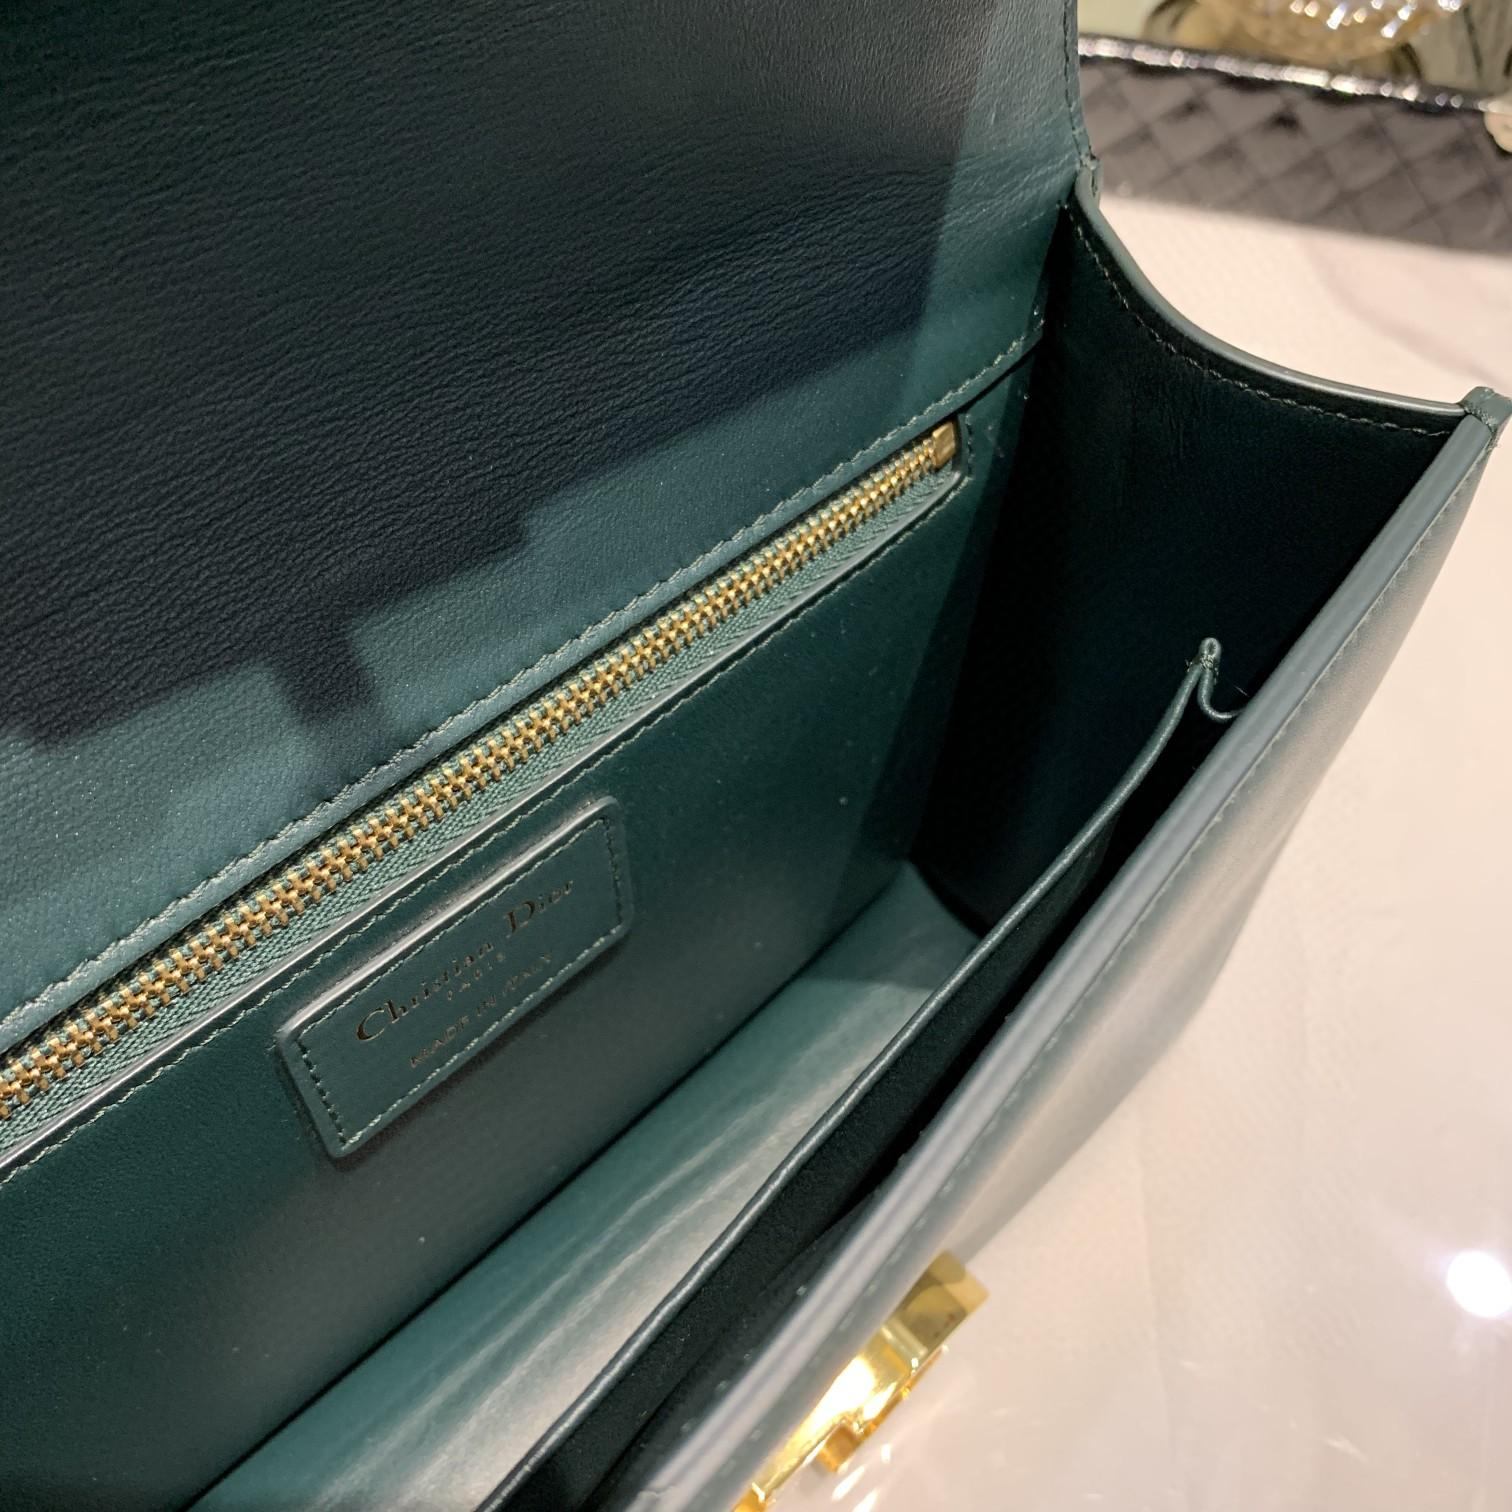 #Montaigne30#原工厂墨绿胎牛皮 24cm 纯铜五金表面电镀24k金 德国亚曼粗蜡线 每一个针孔都有特色花型